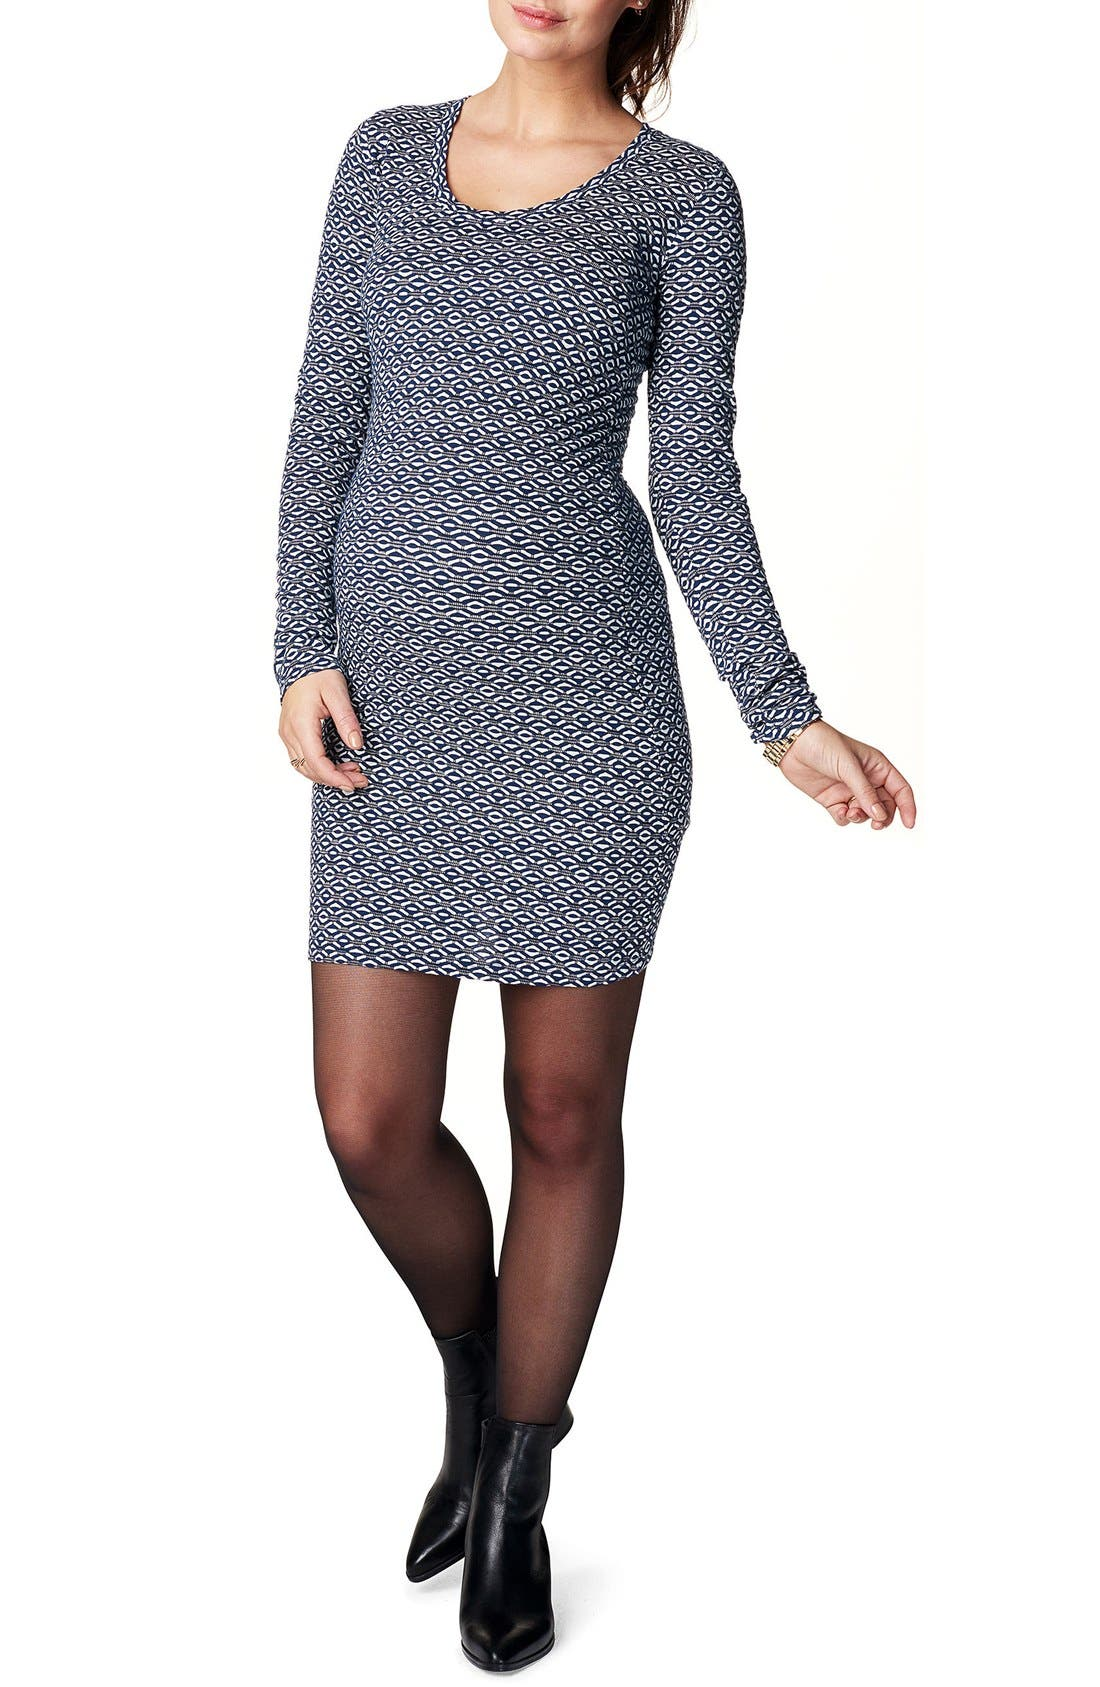 Main Image - Noppies Emma Maternity Body-Con Dress